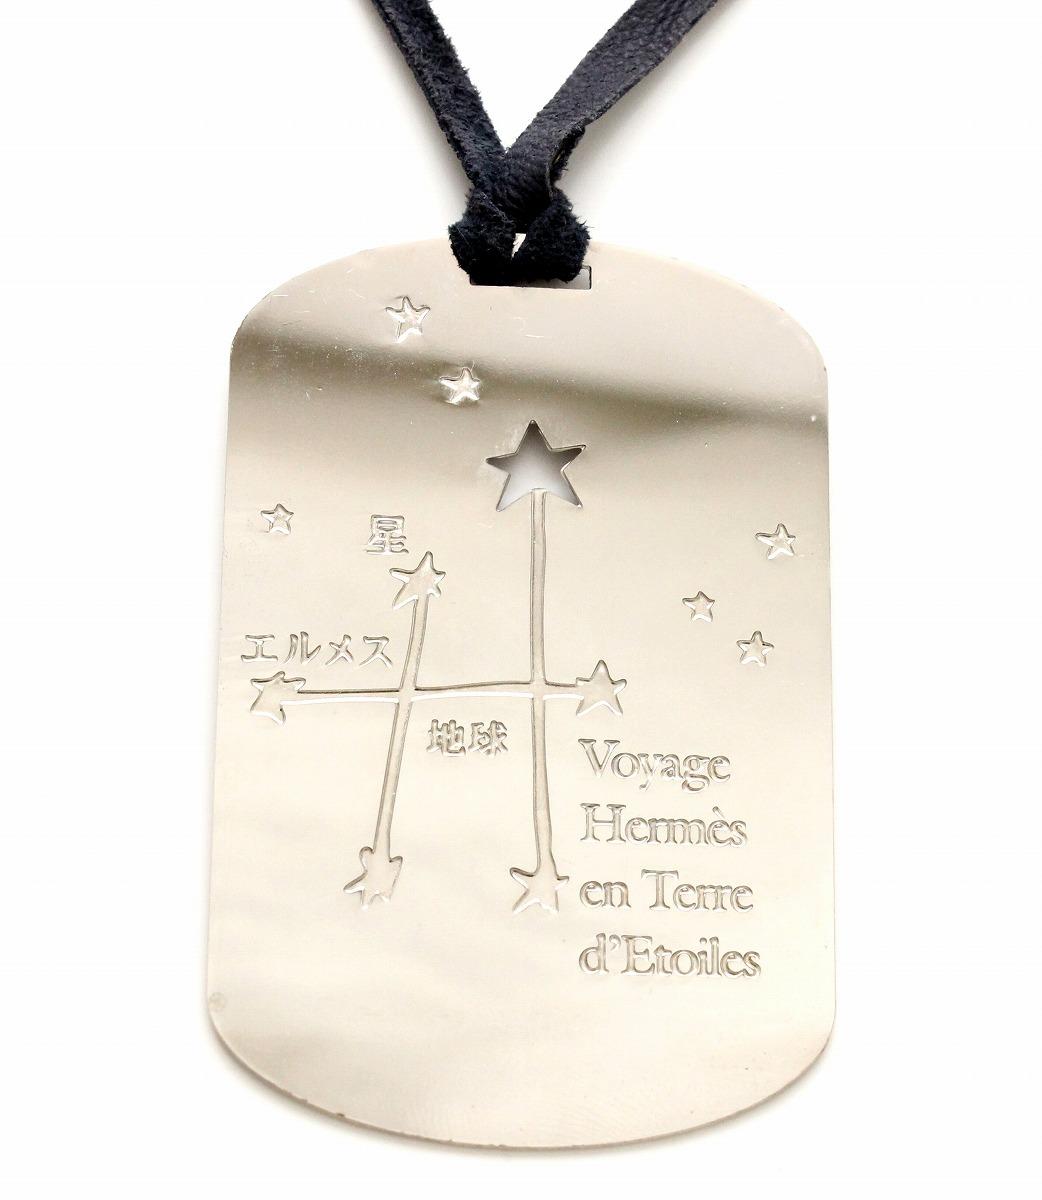 HERMES エルメス 星を巡る旅展 限定品 ネックレス タグ レザー メタル シルバーカラー ネイビー 紺 【中古】【Blumin/森田質店】【質屋出品】【u】